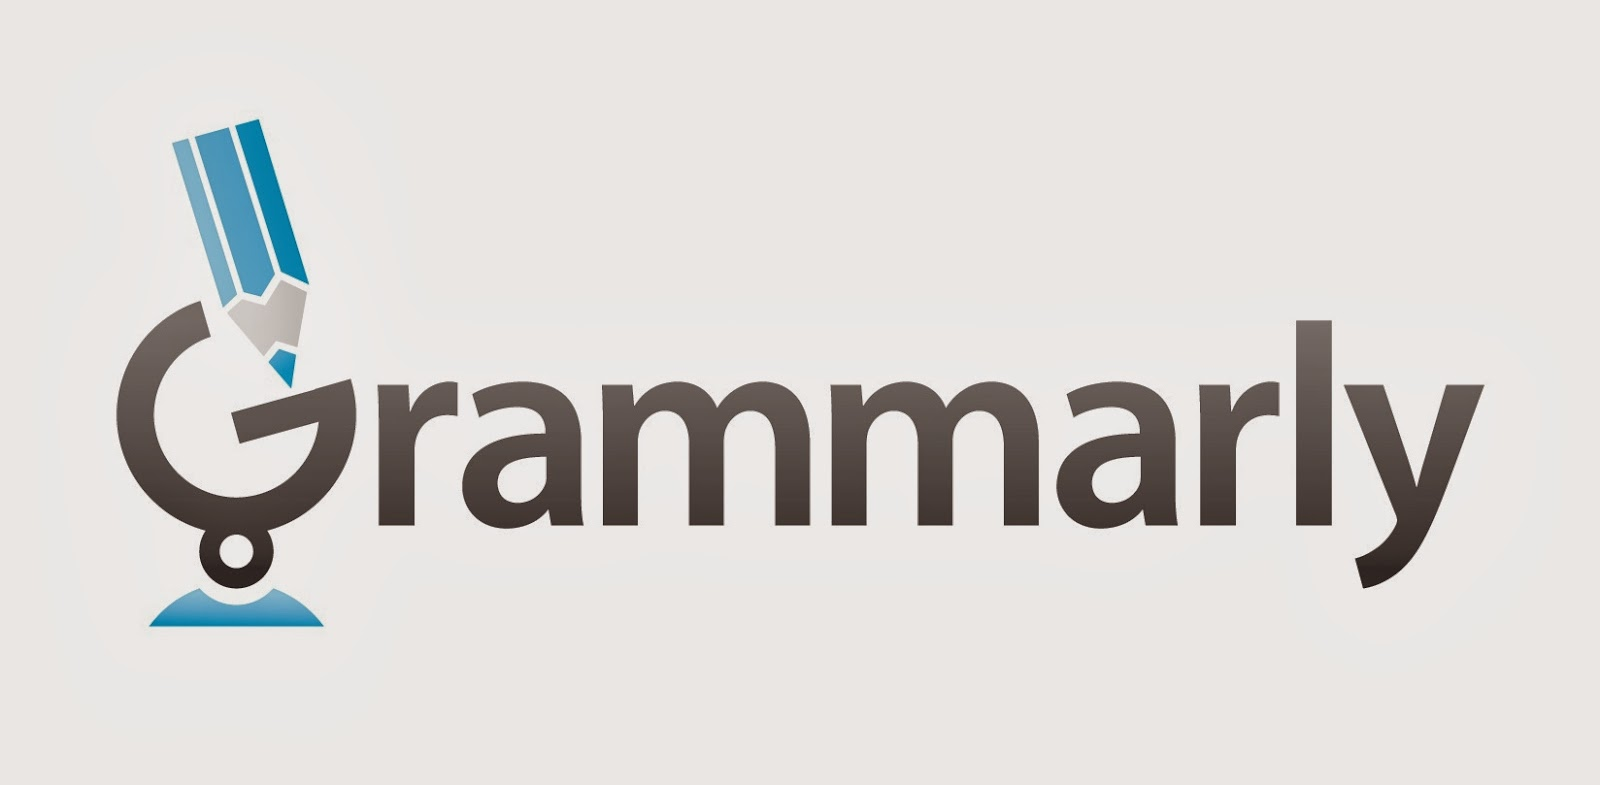 alessa s adversaria the 1 grammar foe for an english learner alessa s adversaria